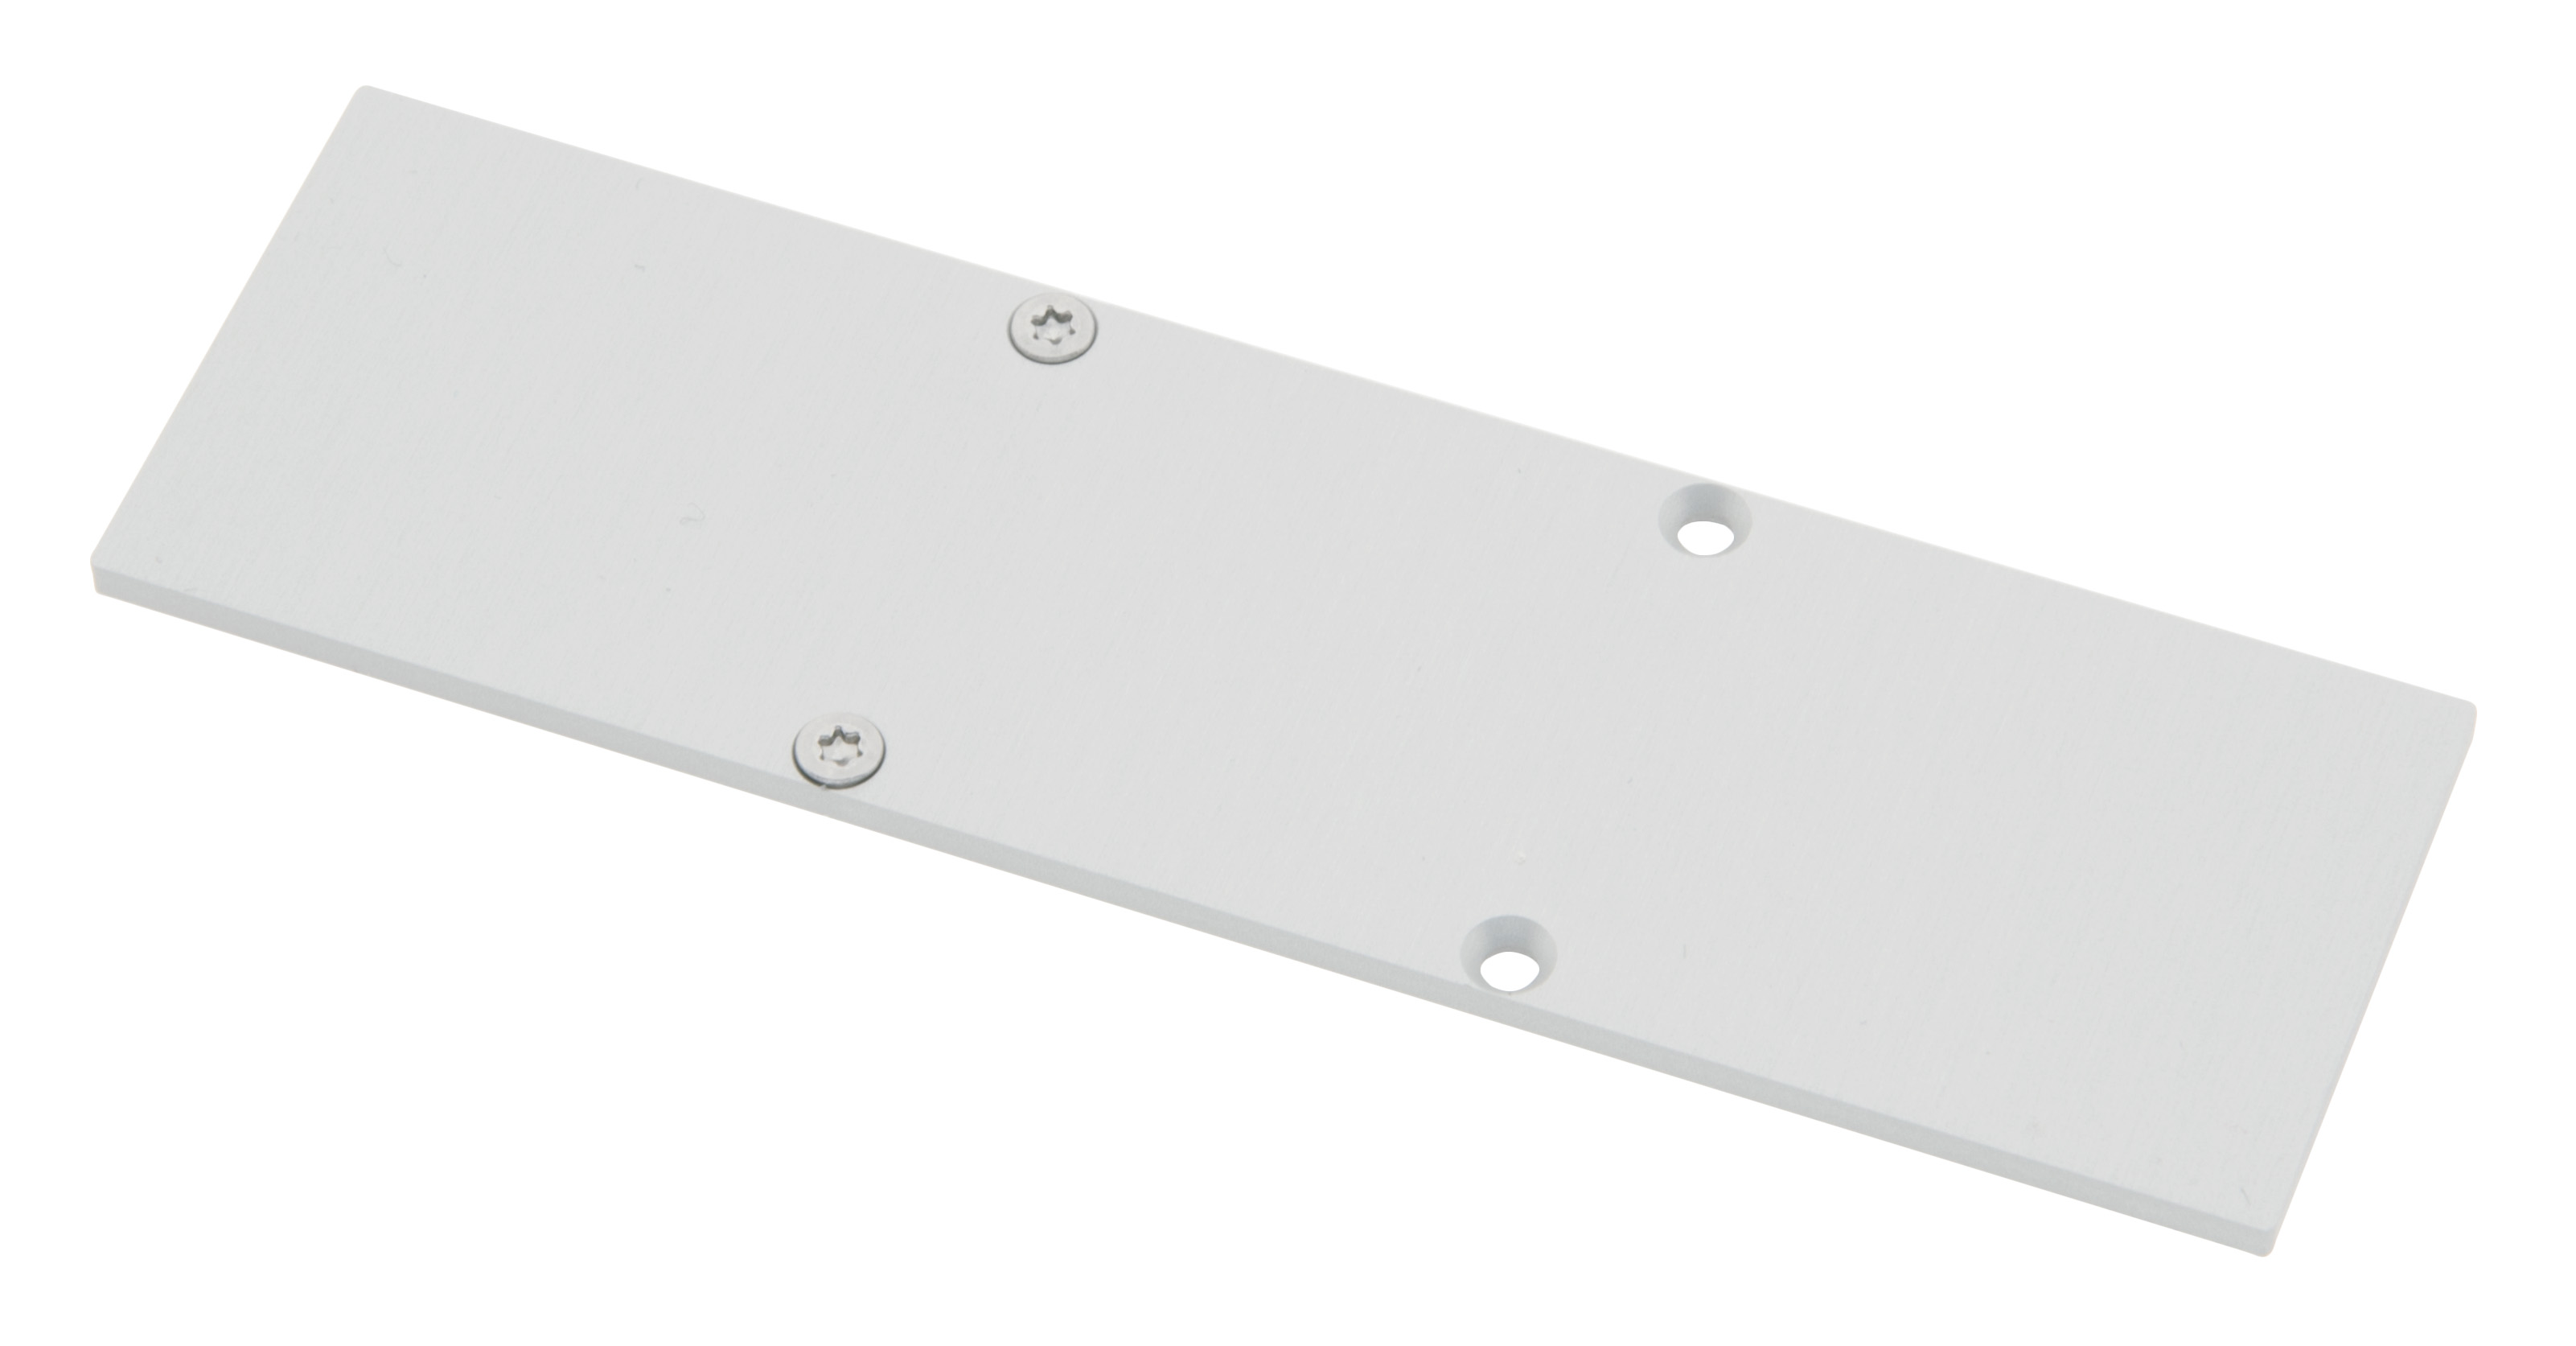 1 Stk Profil Endkappe CLW Eckig geschlossen inkl. Schrauben LIEK006520